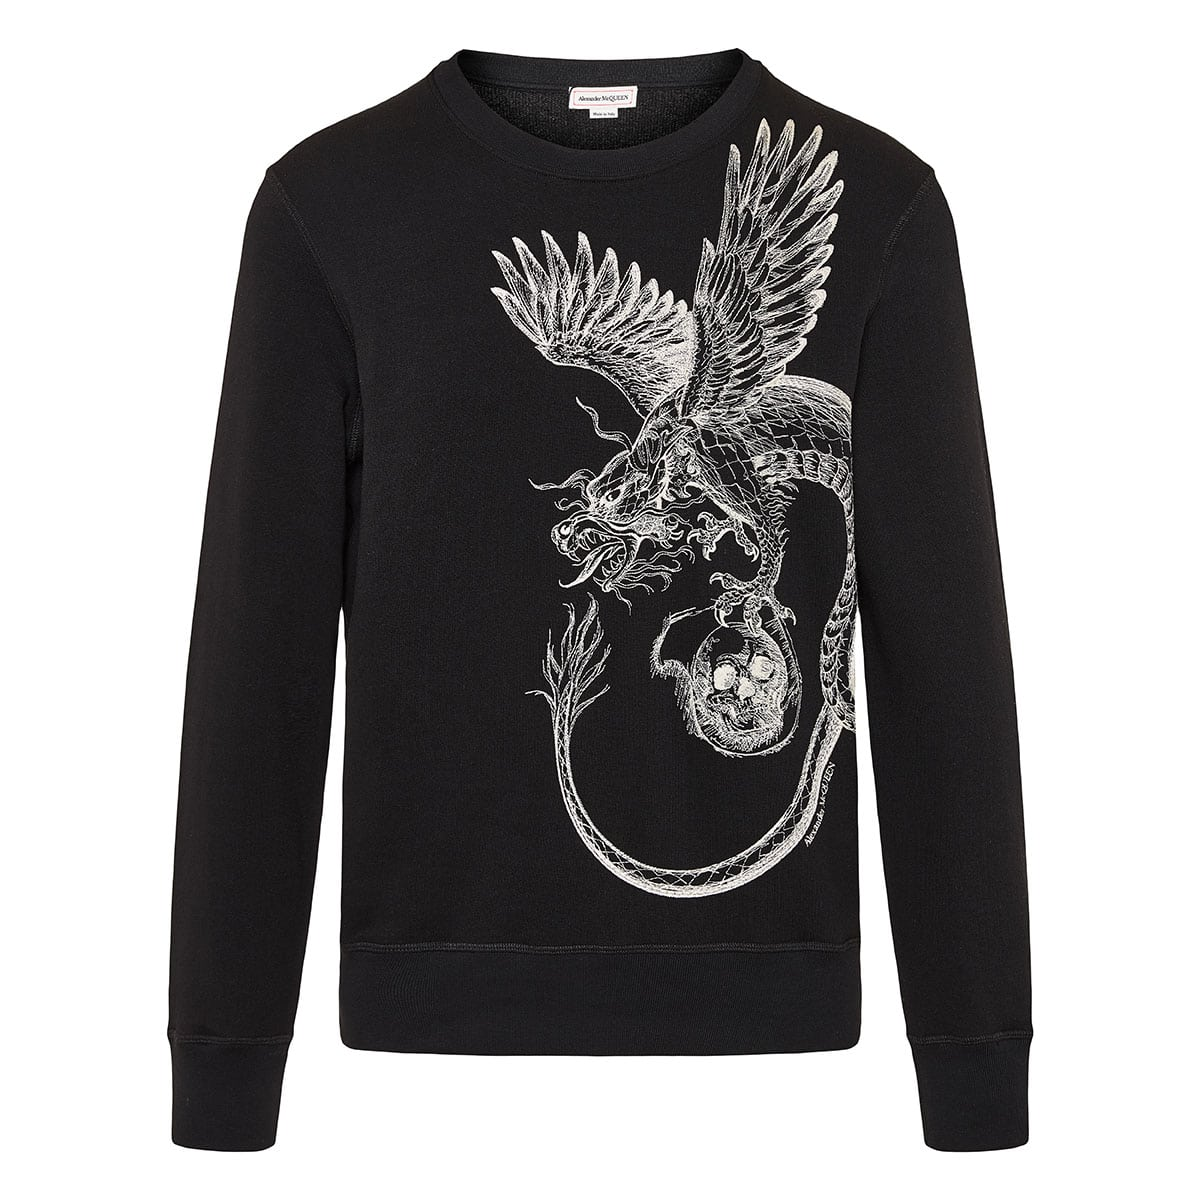 Embroidered Dragon sweatshirt